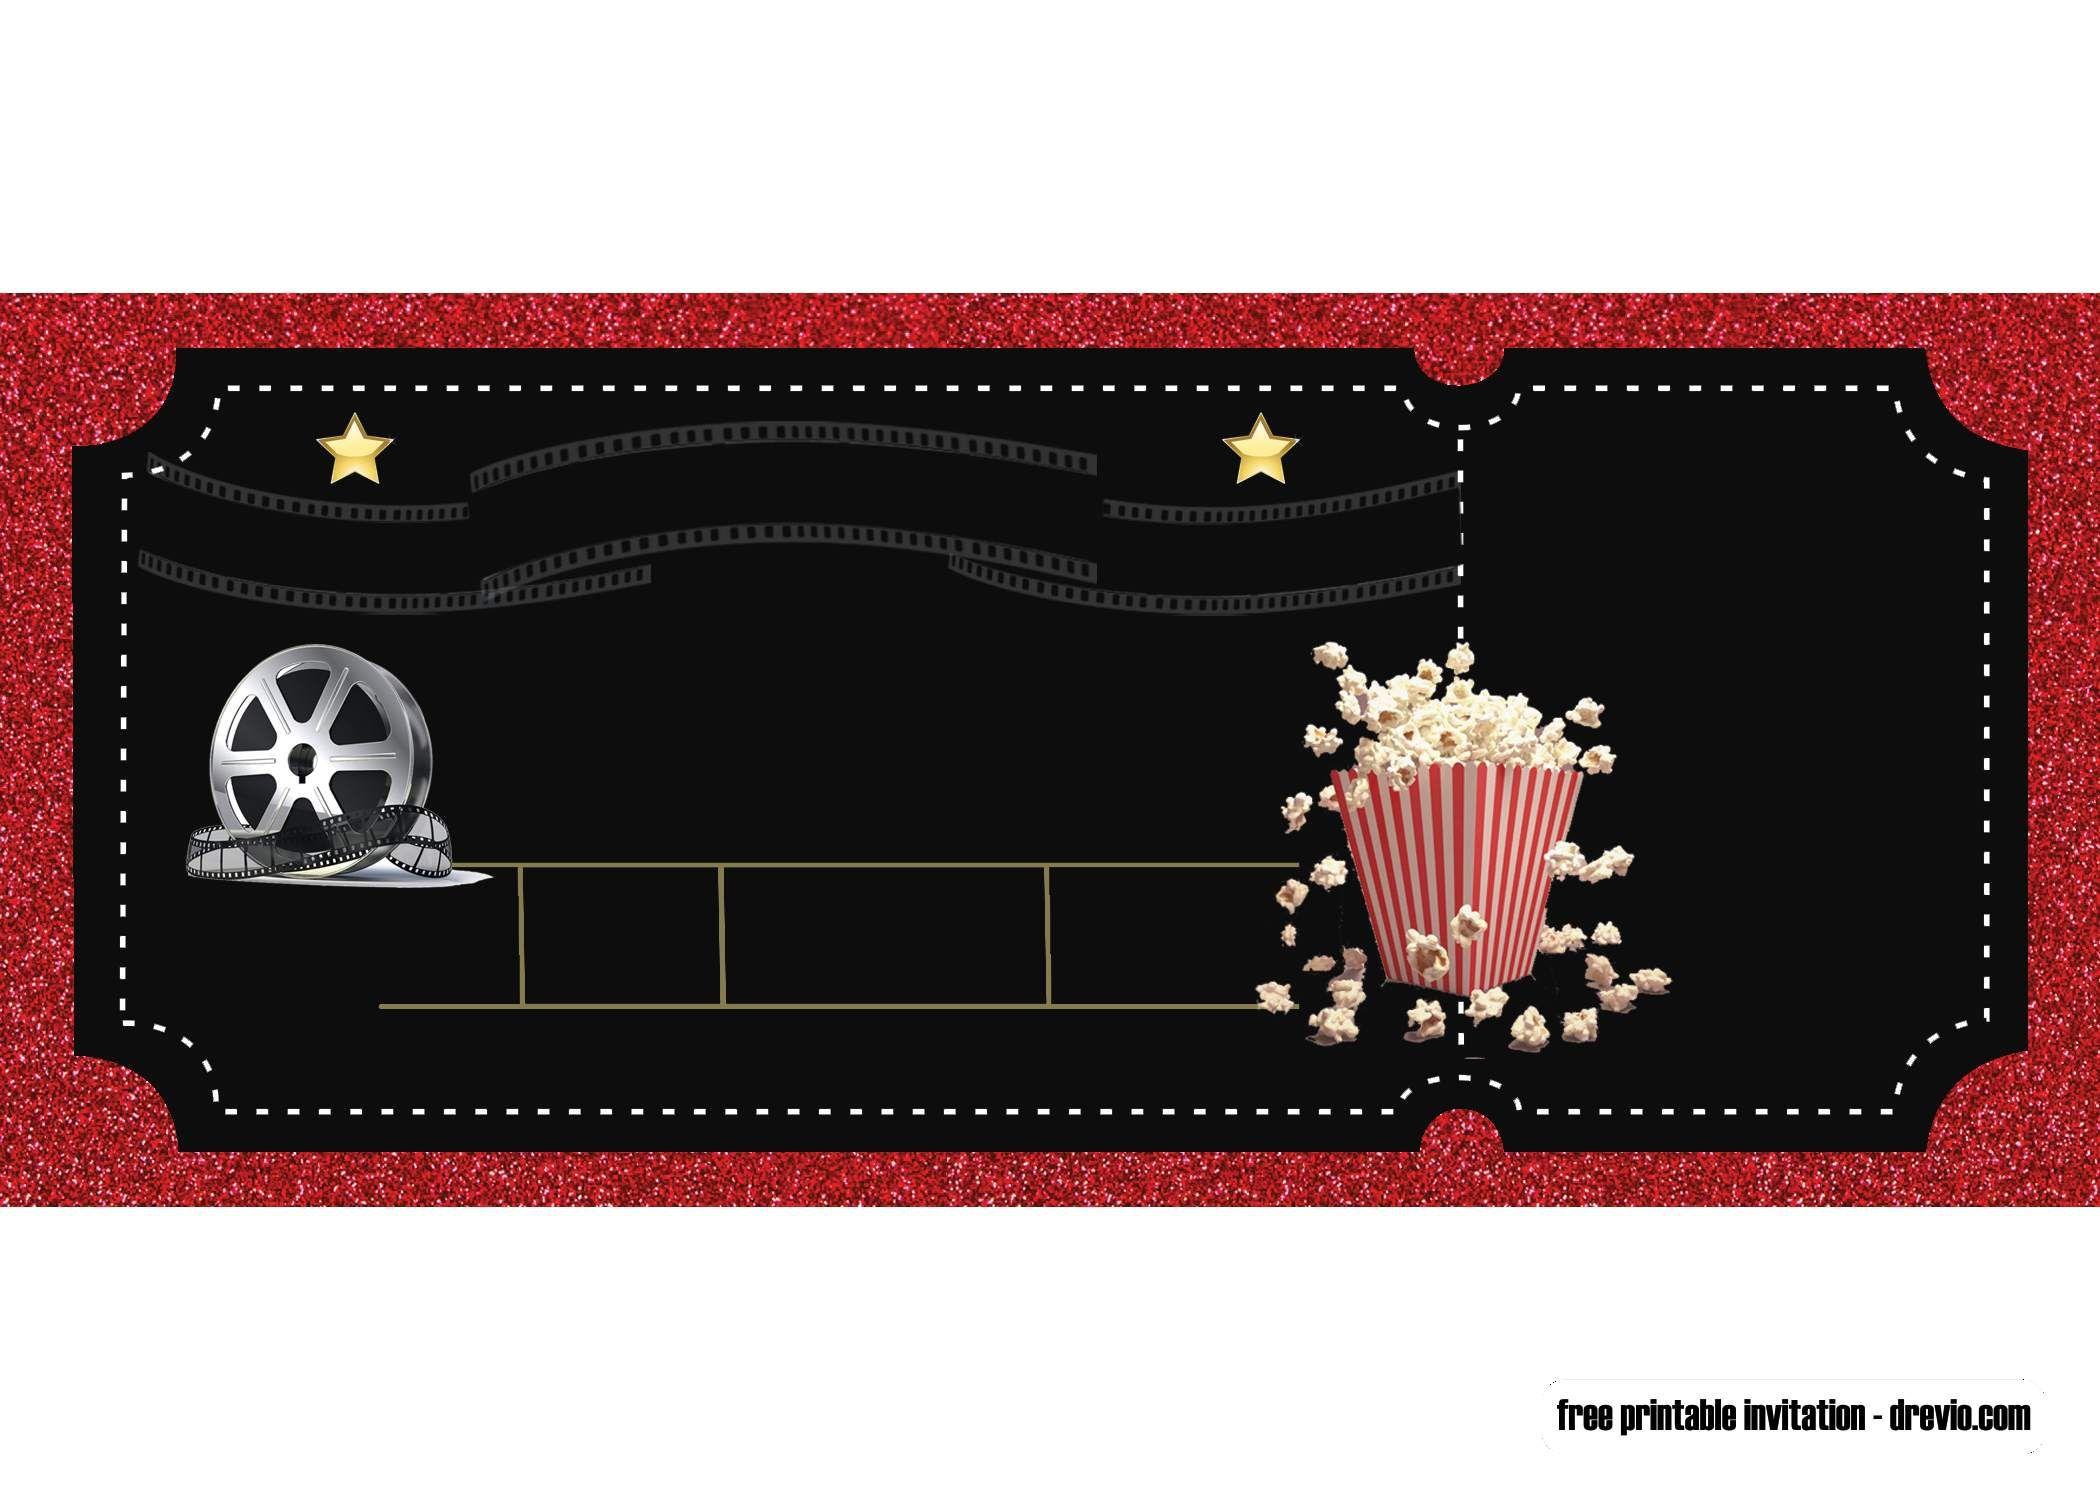 007 Rare Free Printable Movie Ticket Birthday Party Invitation Sample Full